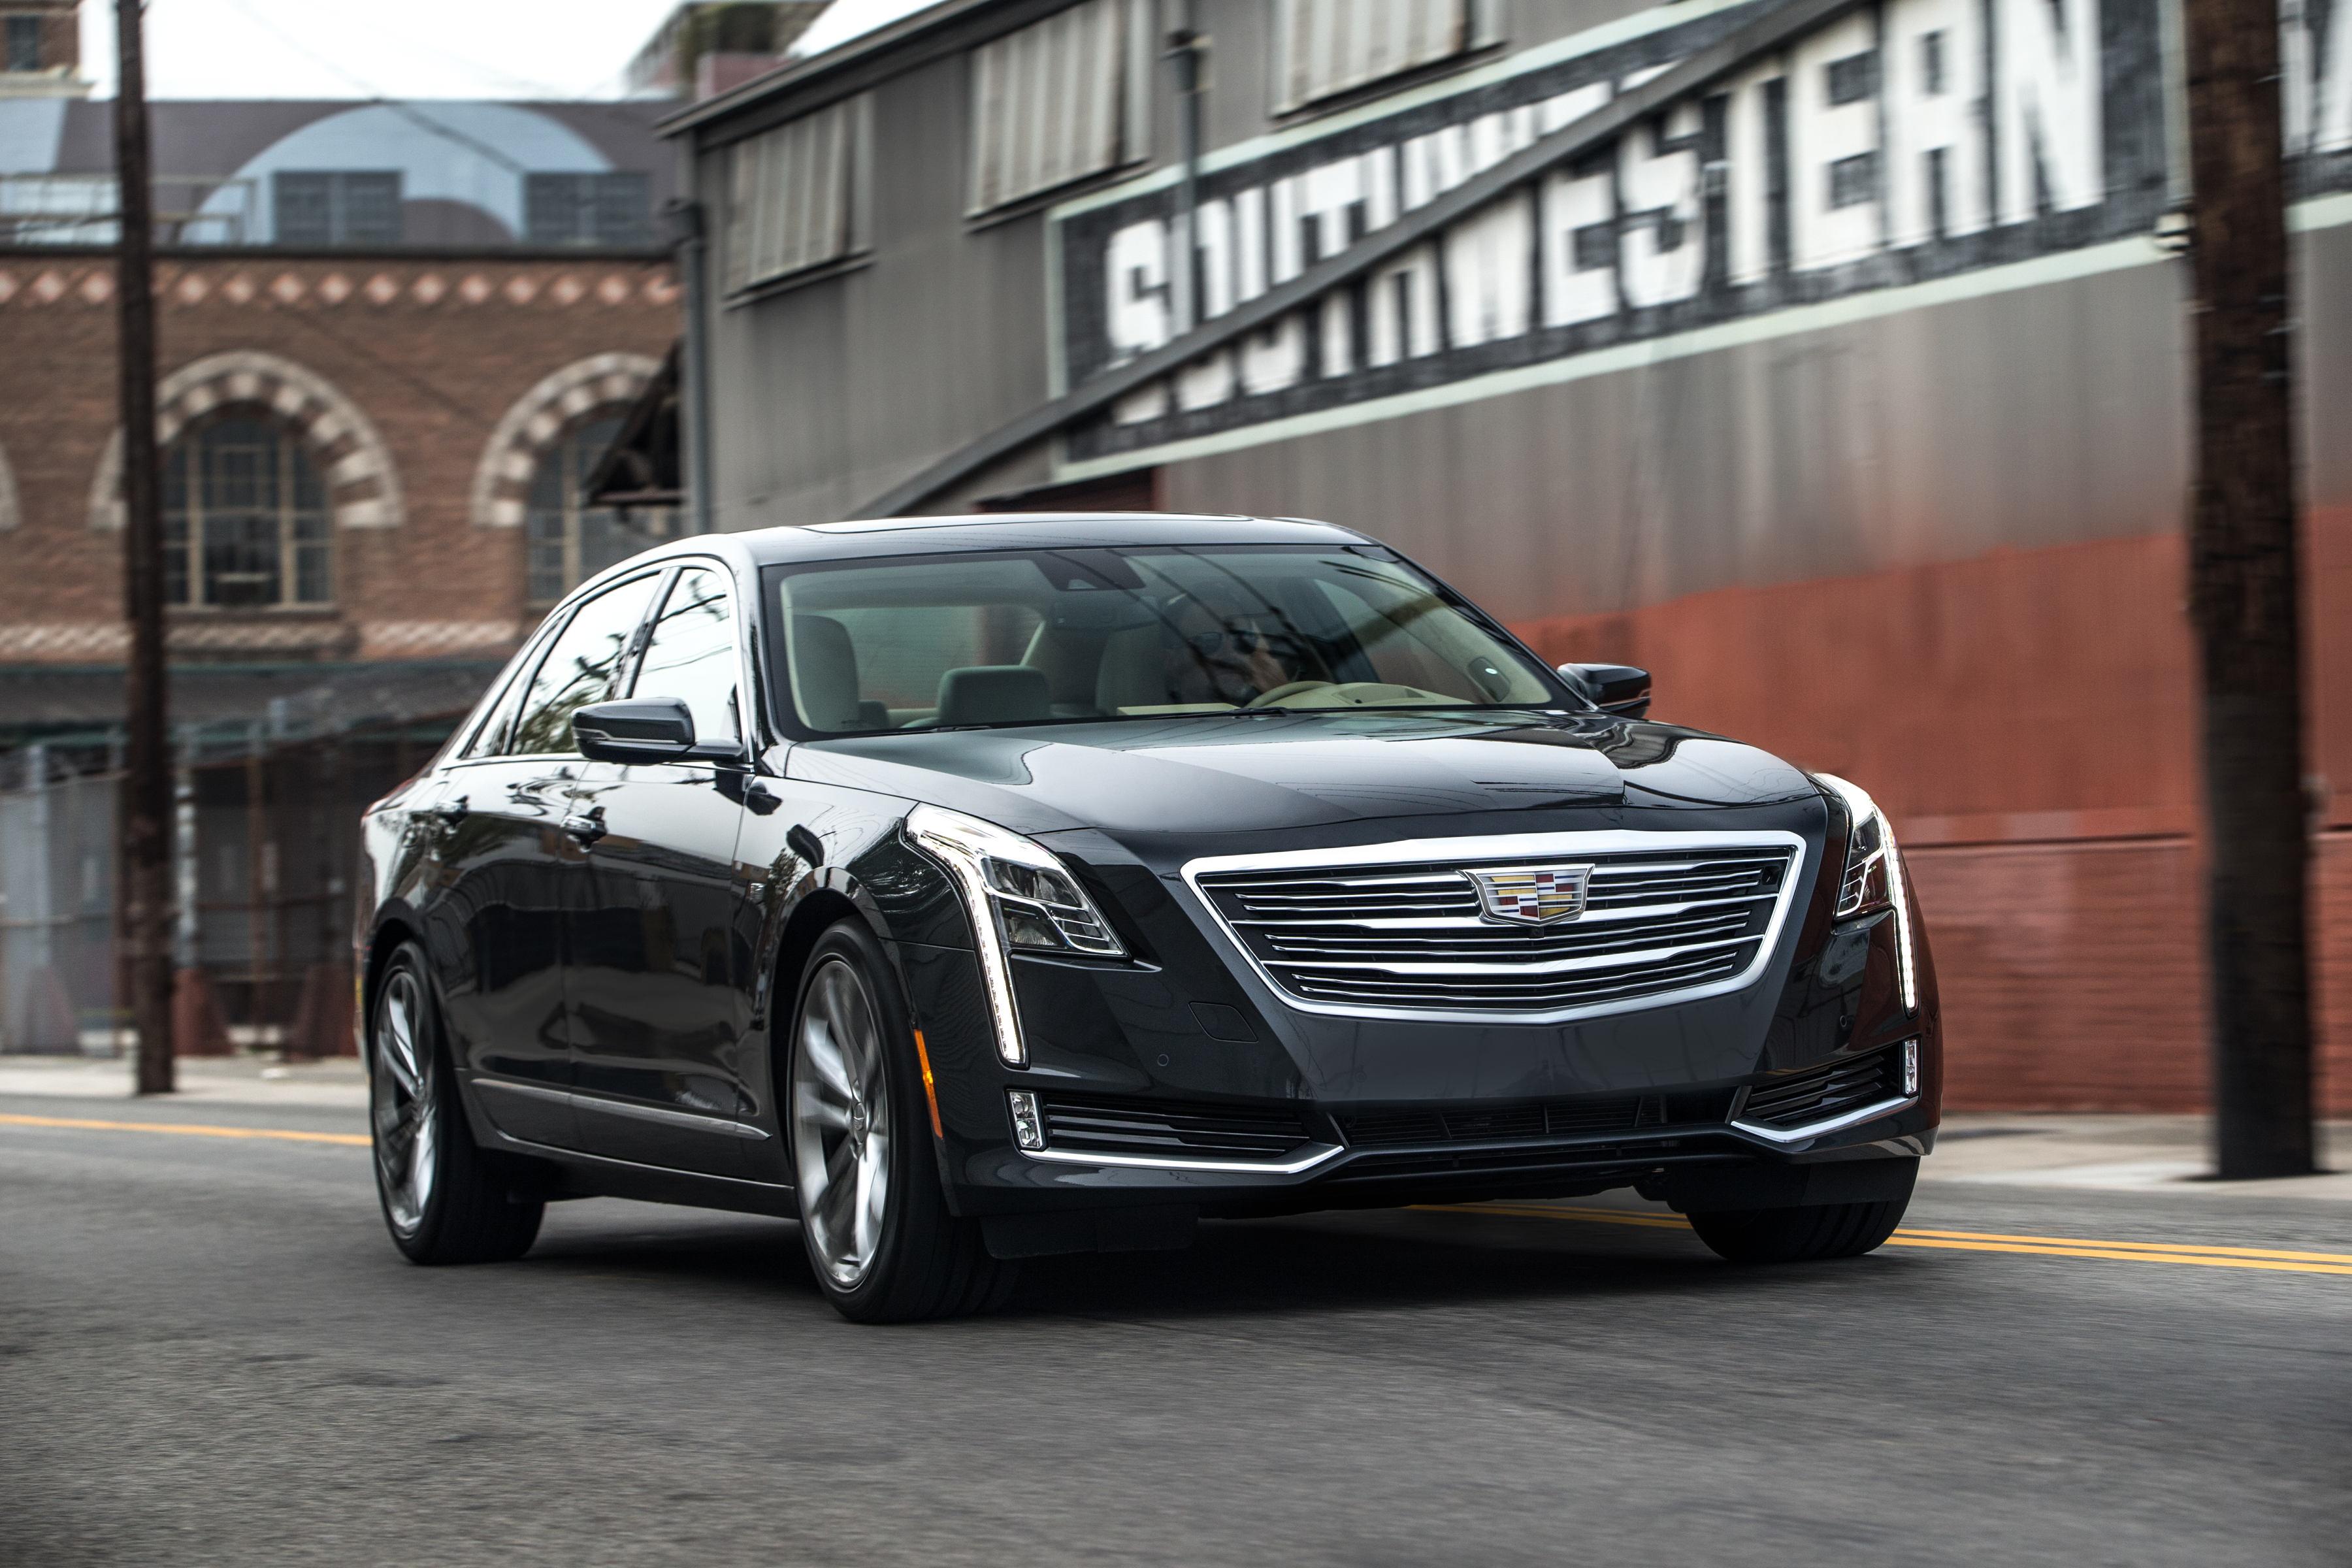 A black 2017 Cadillac CT6, a large luxury sedan, on a city street.